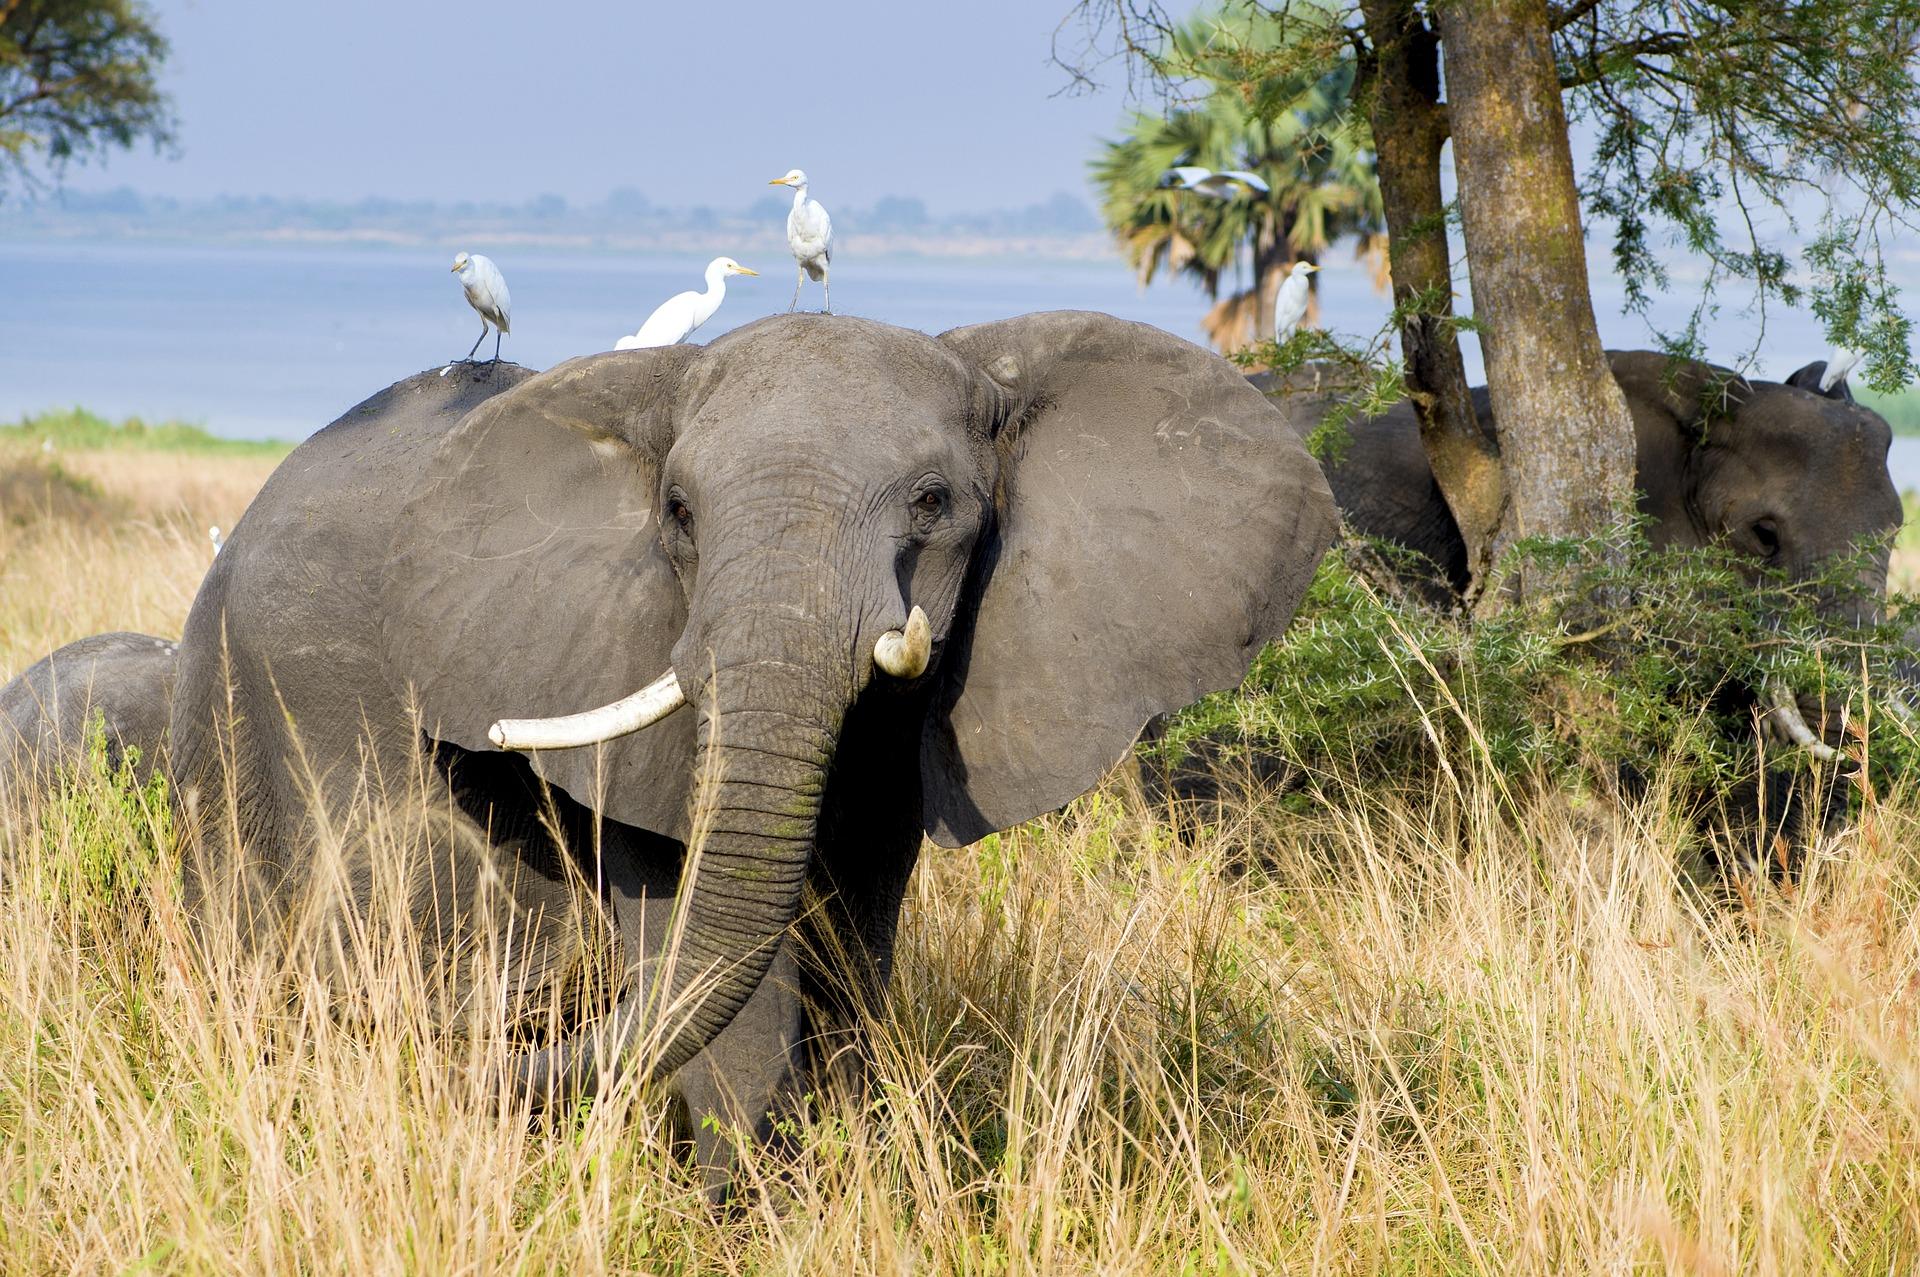 elephant-2108855_1920